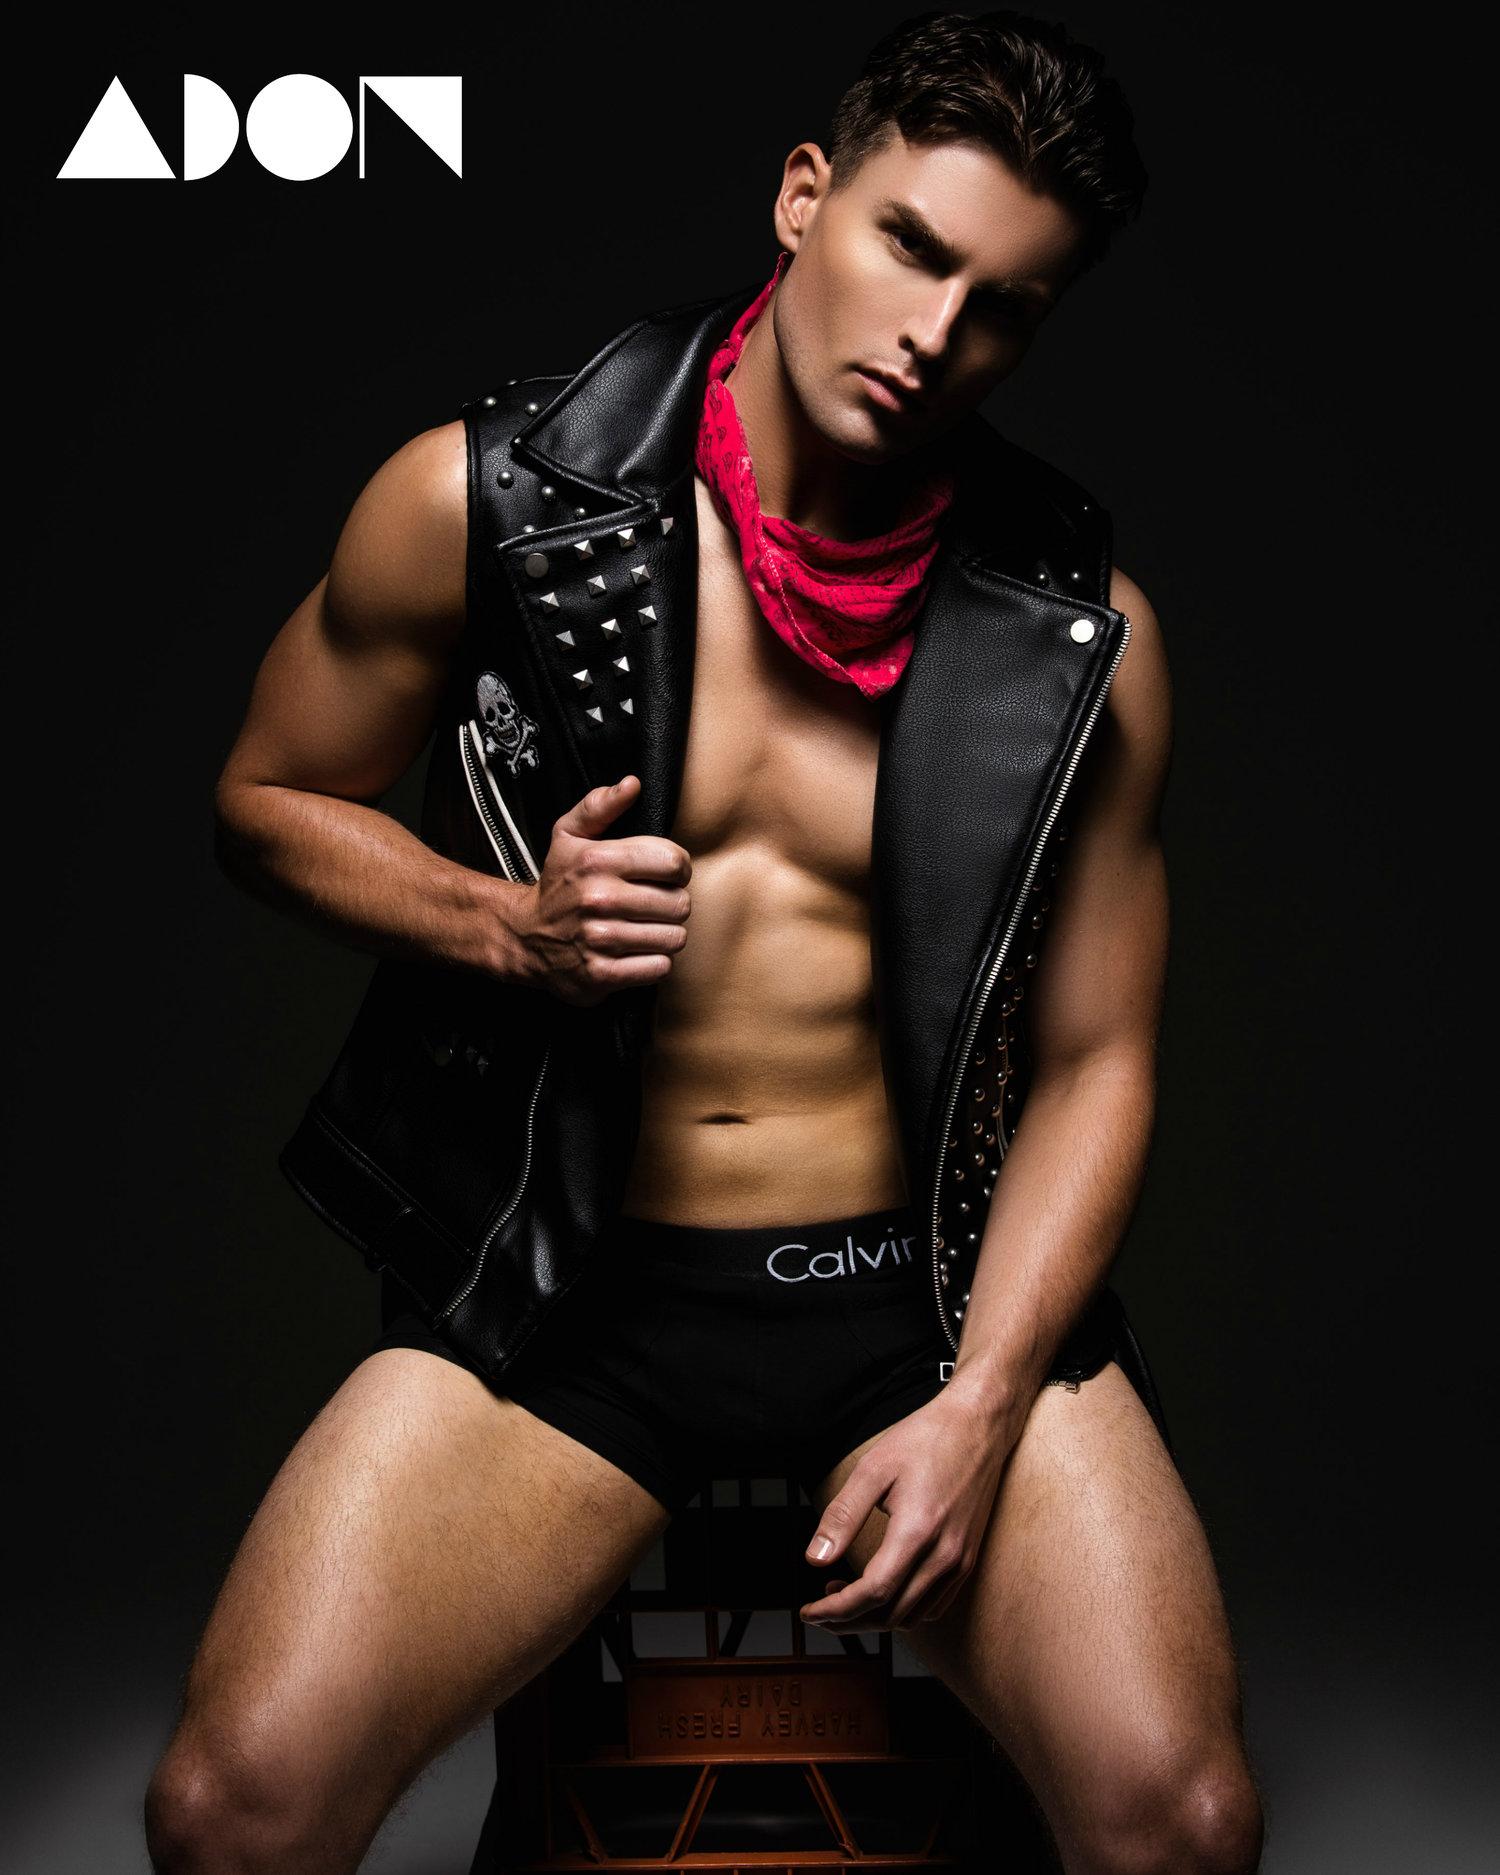 Adon Exclusive: Model Stefan Burrows By Daniel Enright